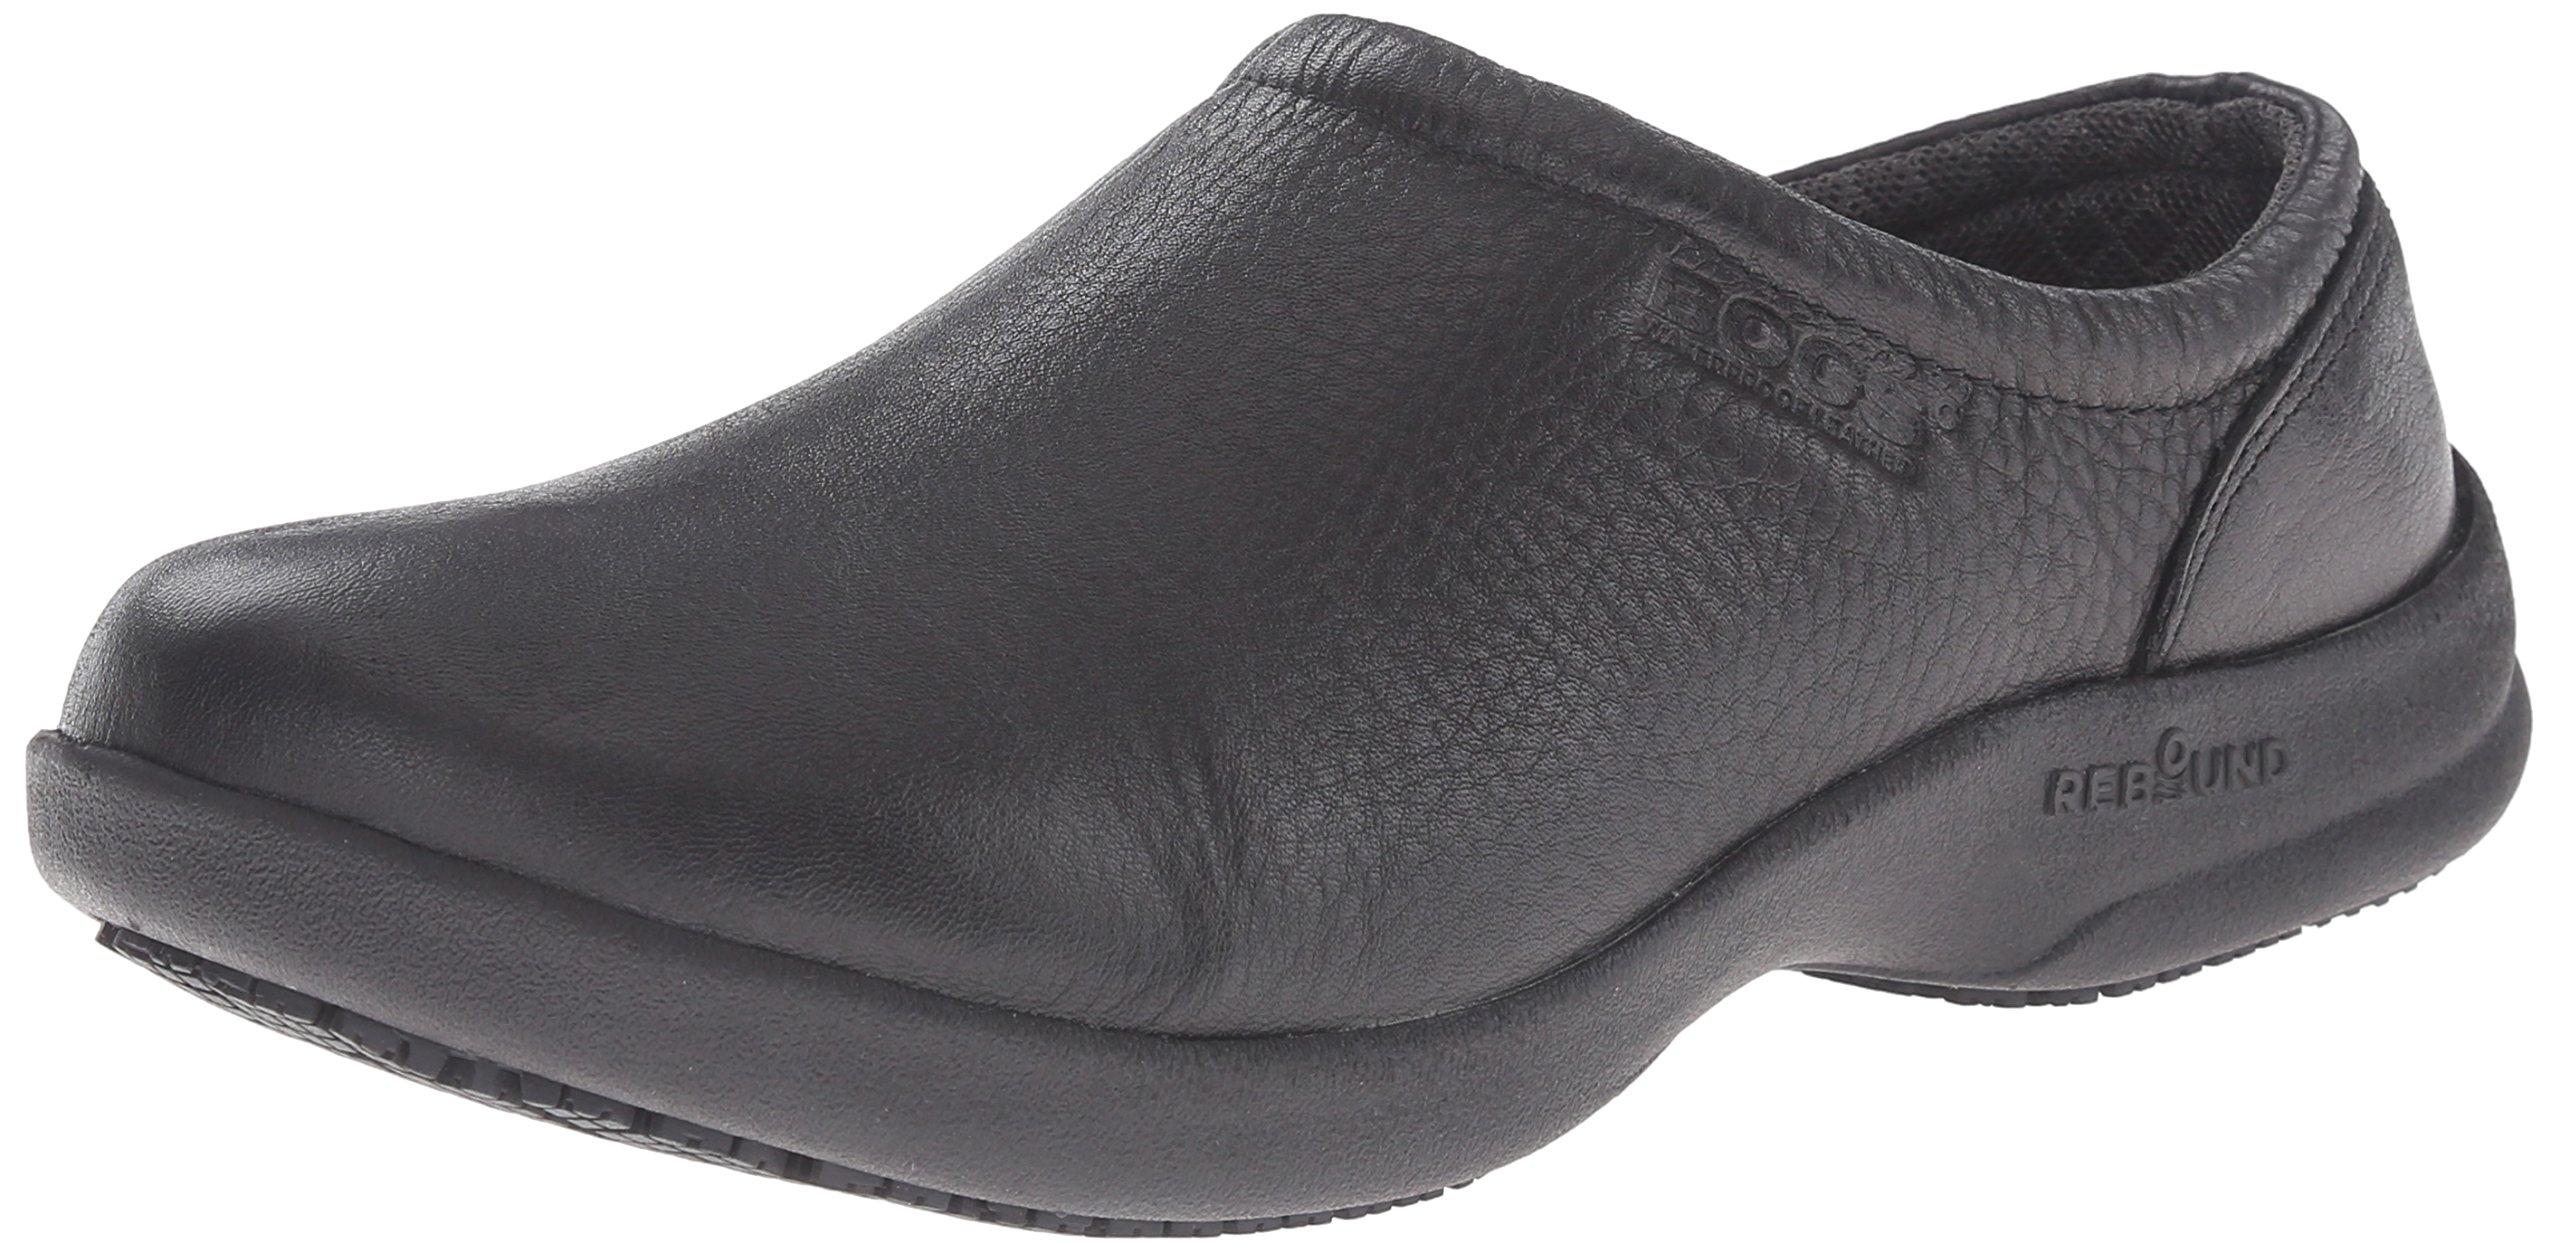 Bogs Women's Ramsey Leather Slip Resistant Work Shoe, Black, 7 M US